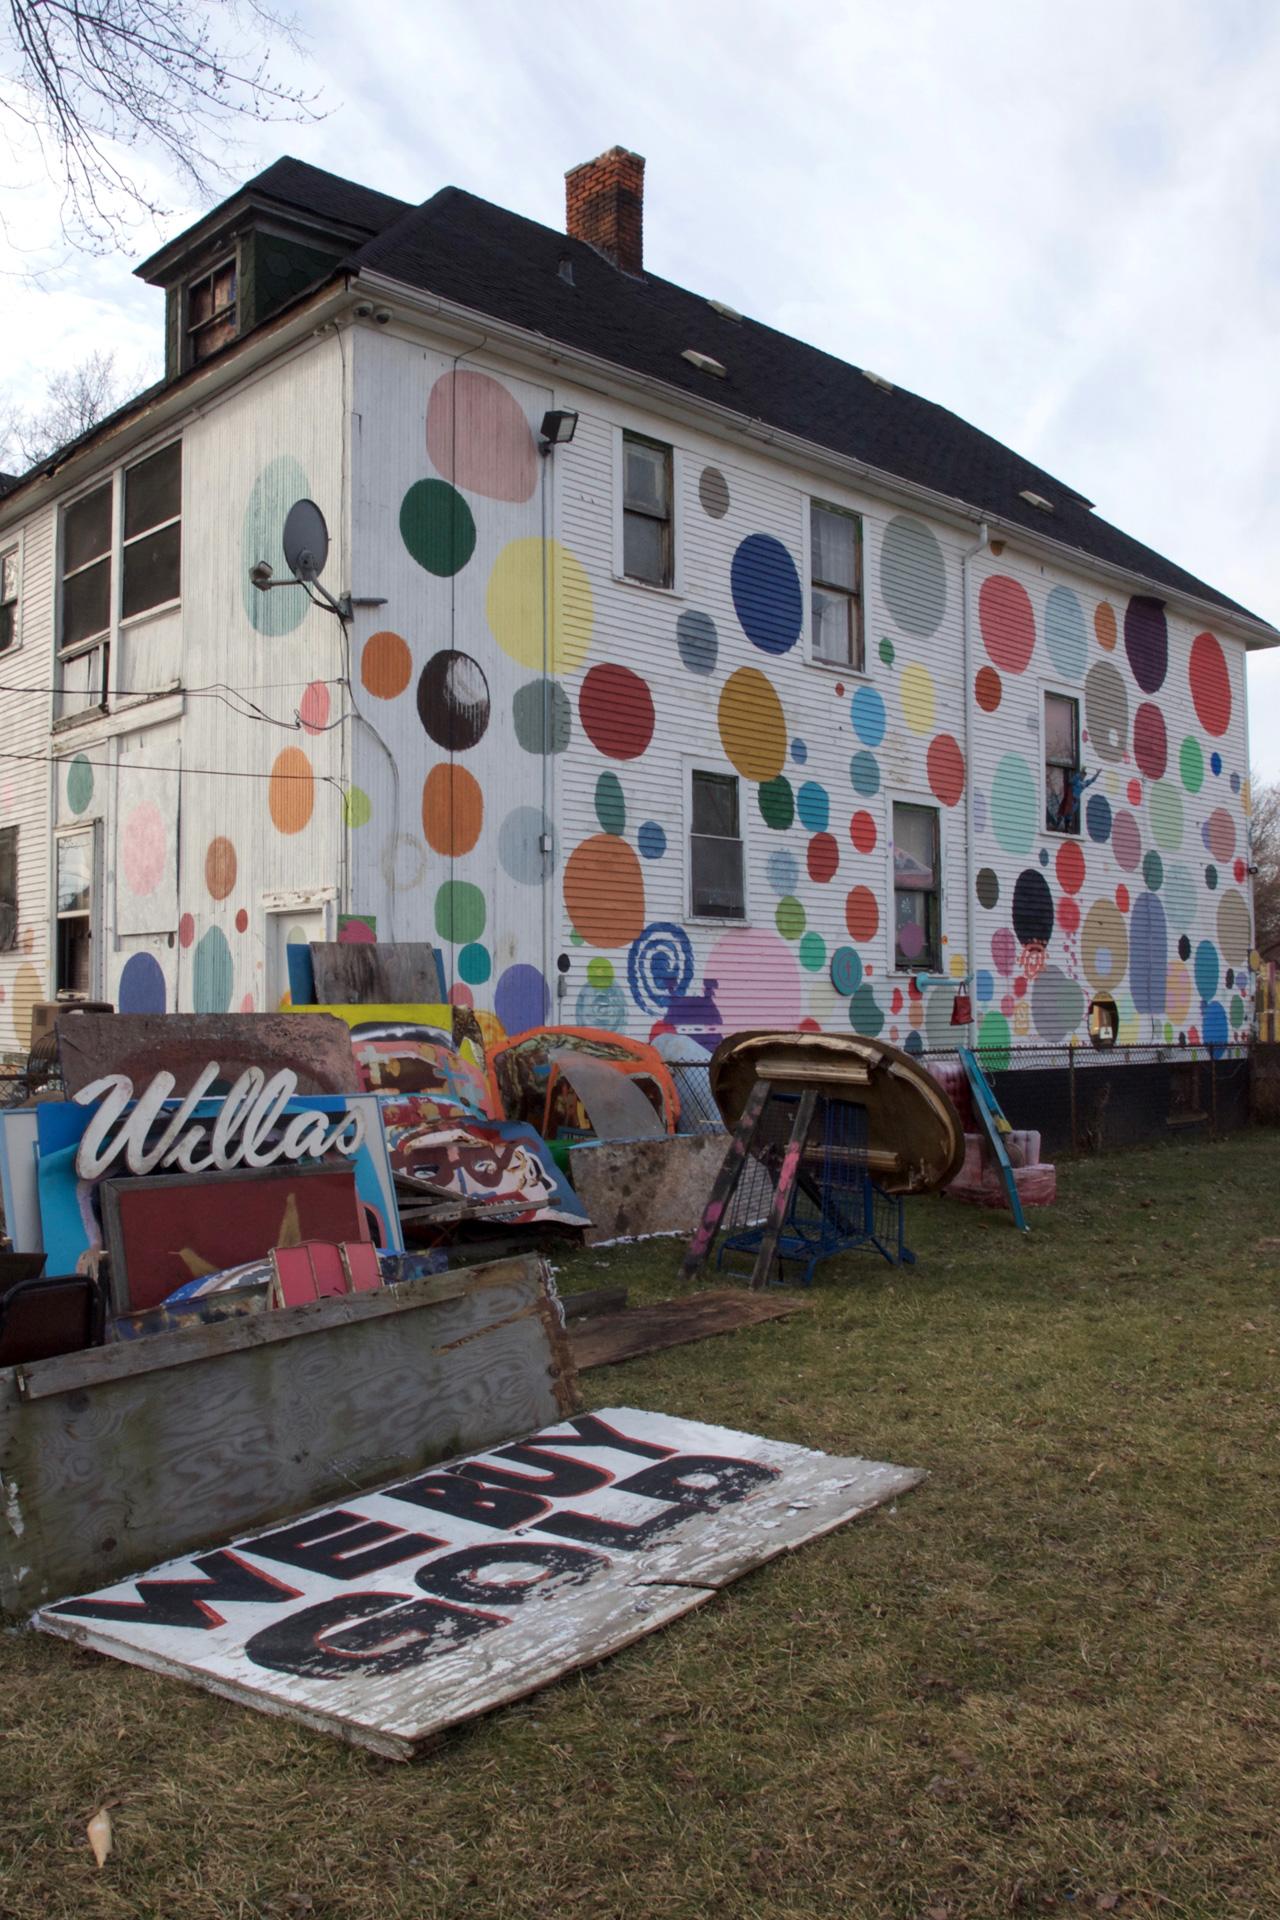 buchstabenplus, Detroit; Heidelberg Project